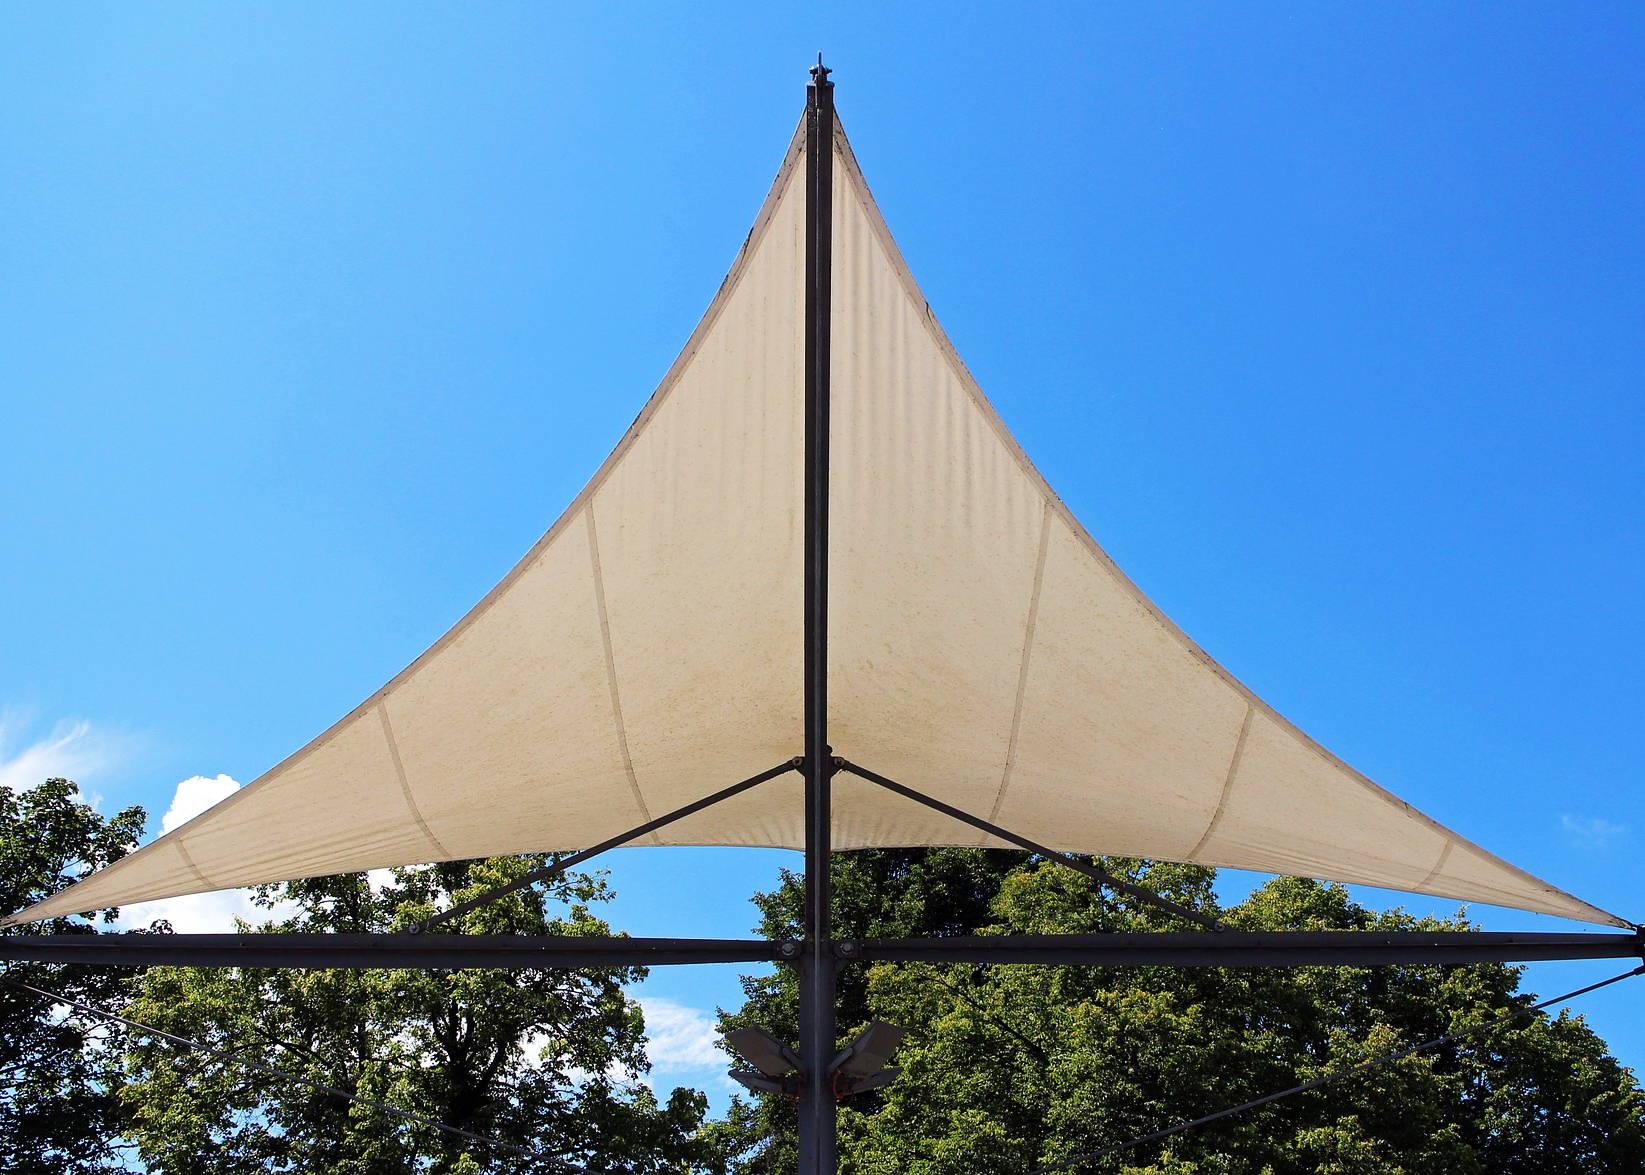 shade-sail-home